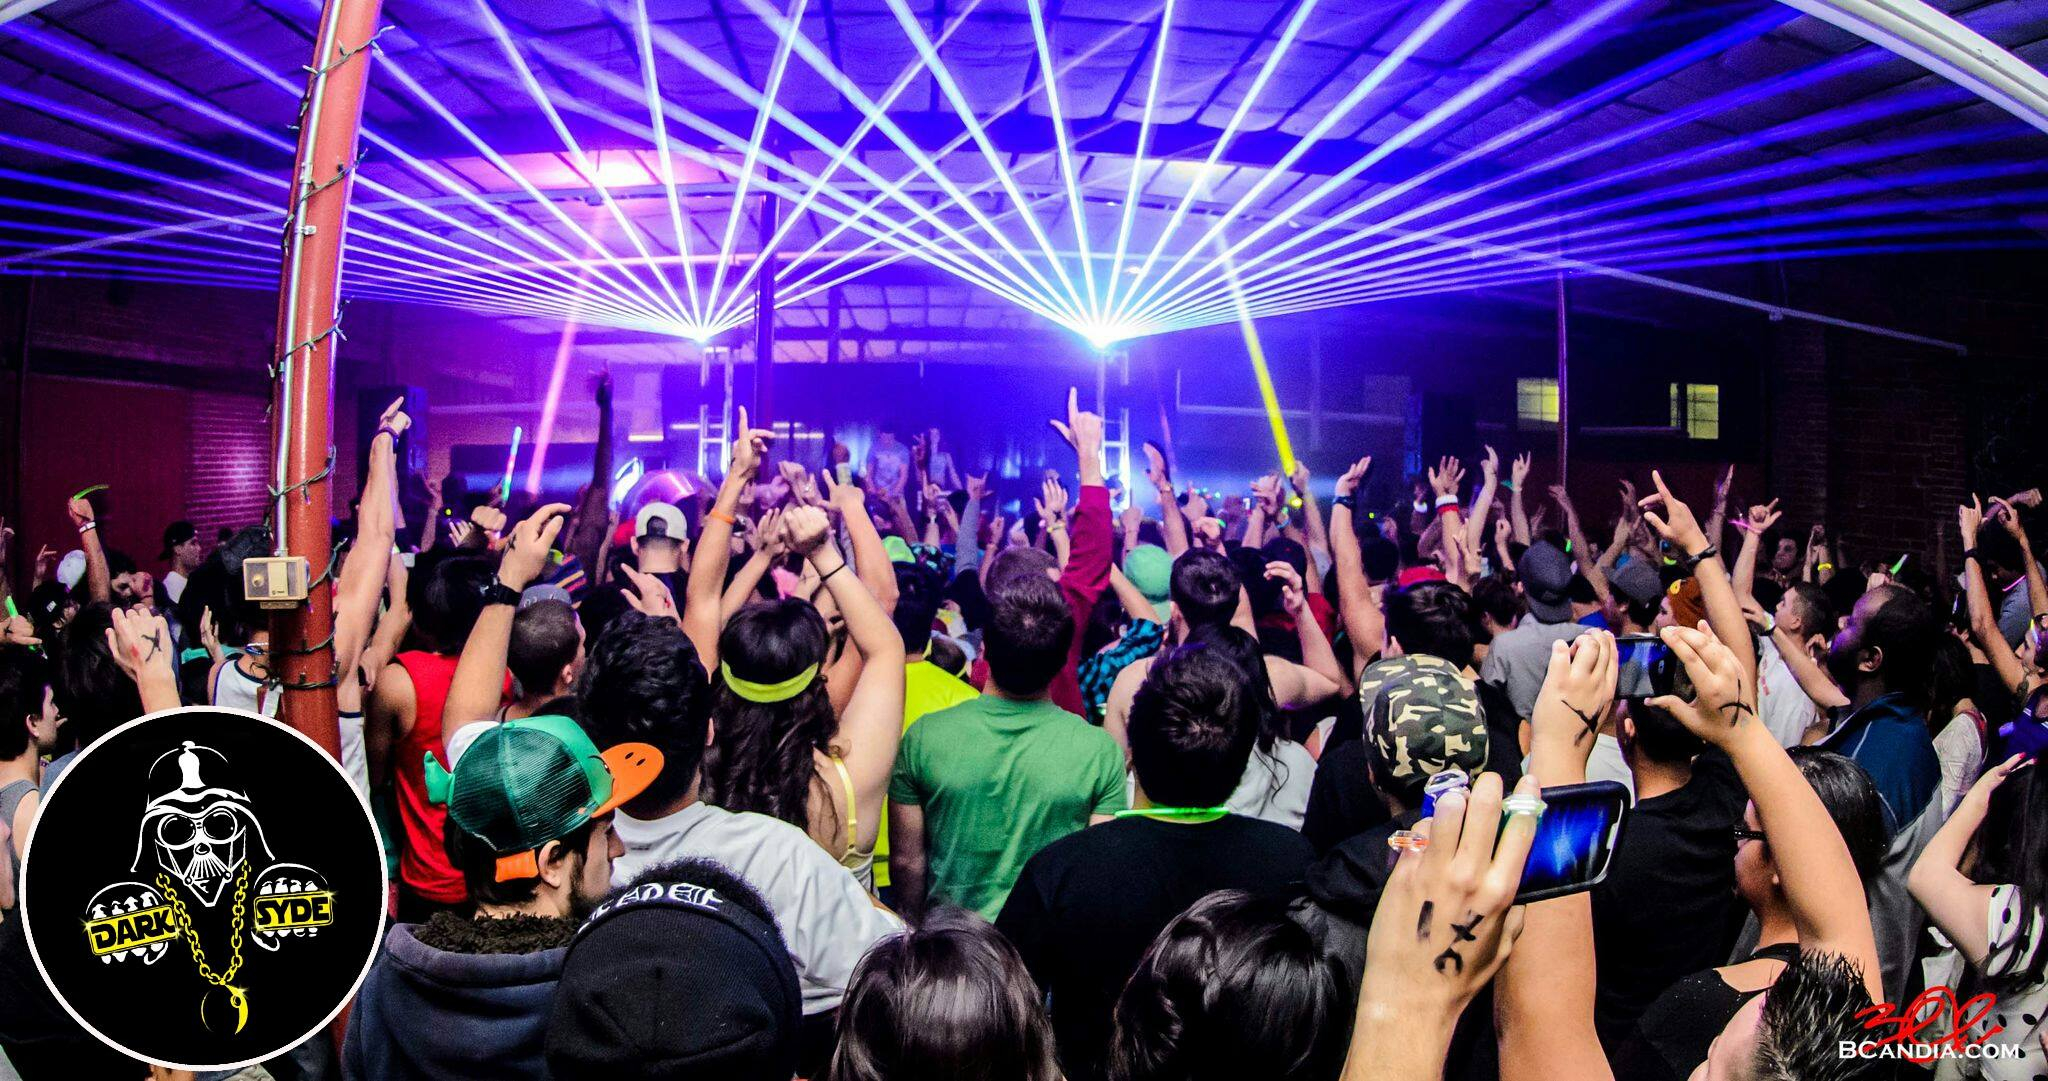 Cosplay/Anime Rave (Satx) Tickets - The Darksyde Music throughout San Antonio Live Music Calendar